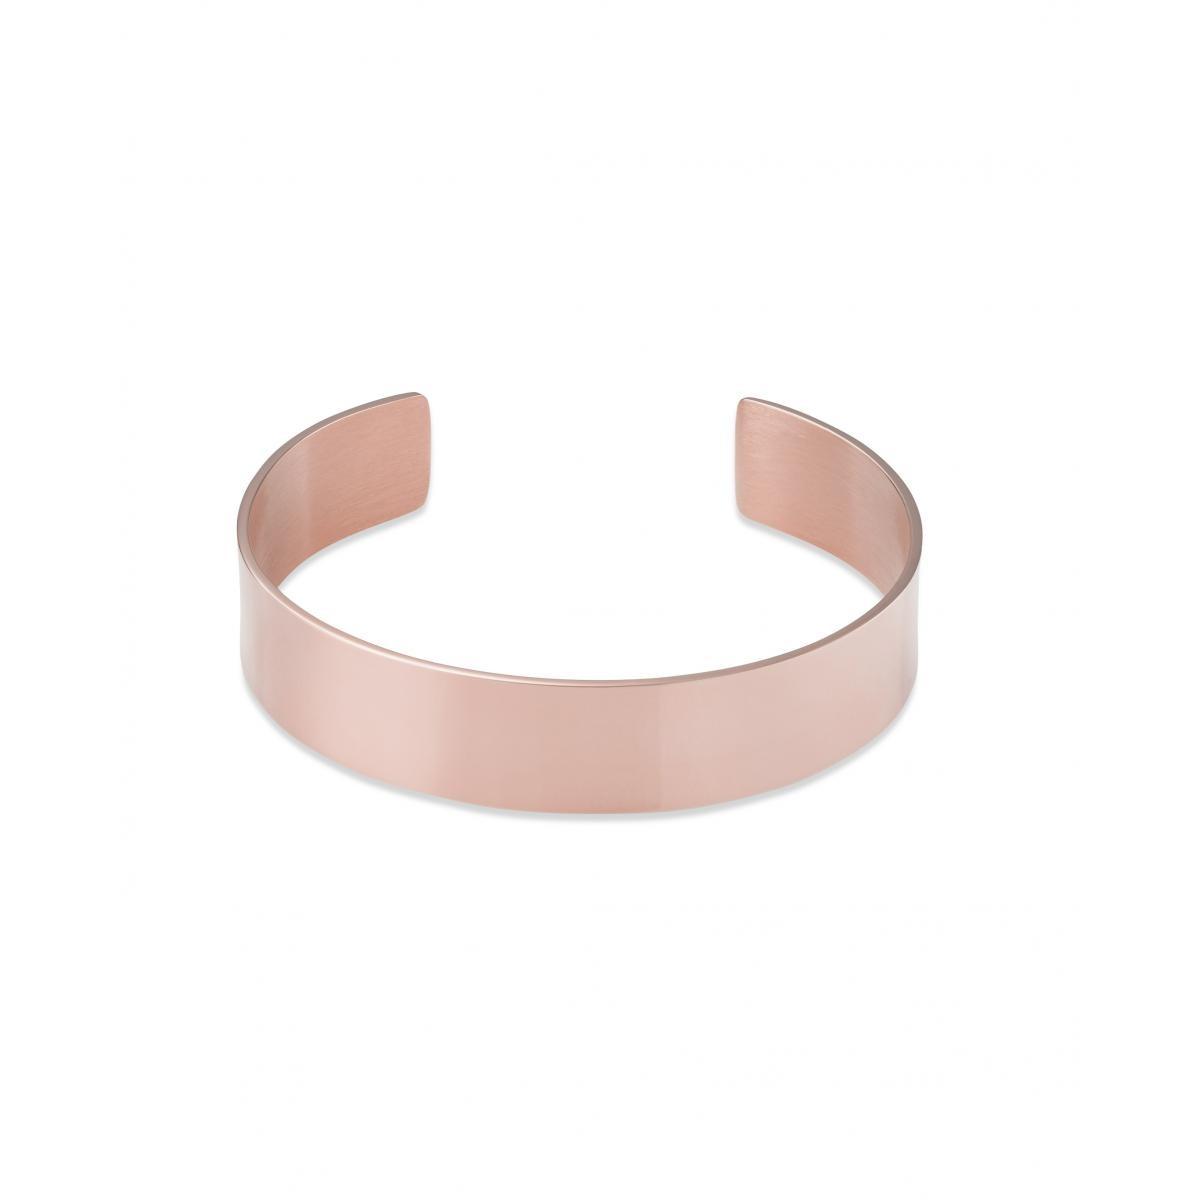 Bracelet Rosefield BBBR-J232 Femme